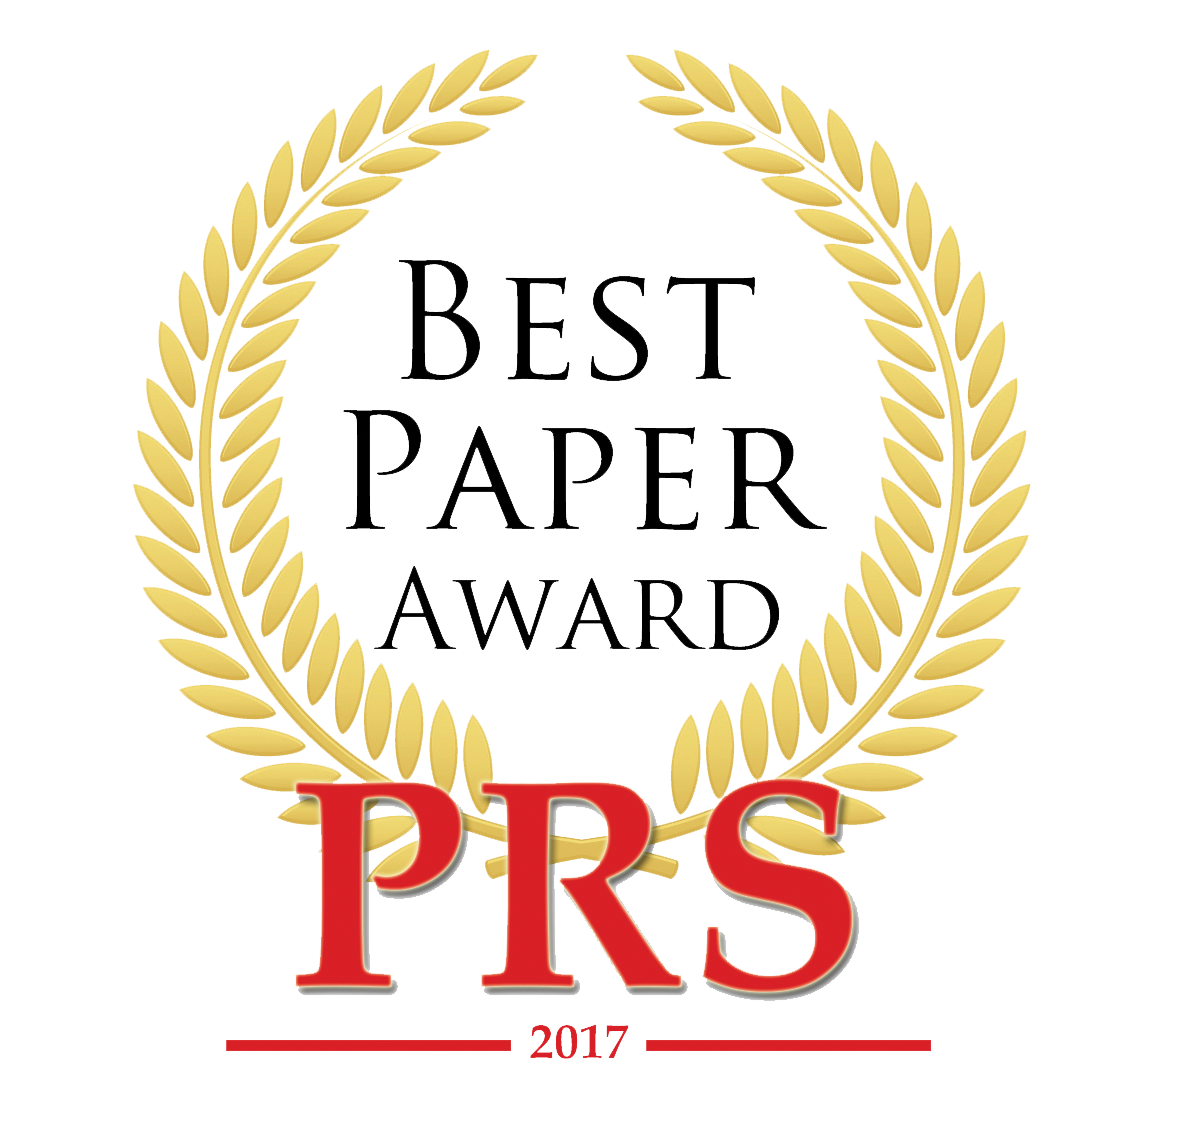 BestPaperAwardPRS2017